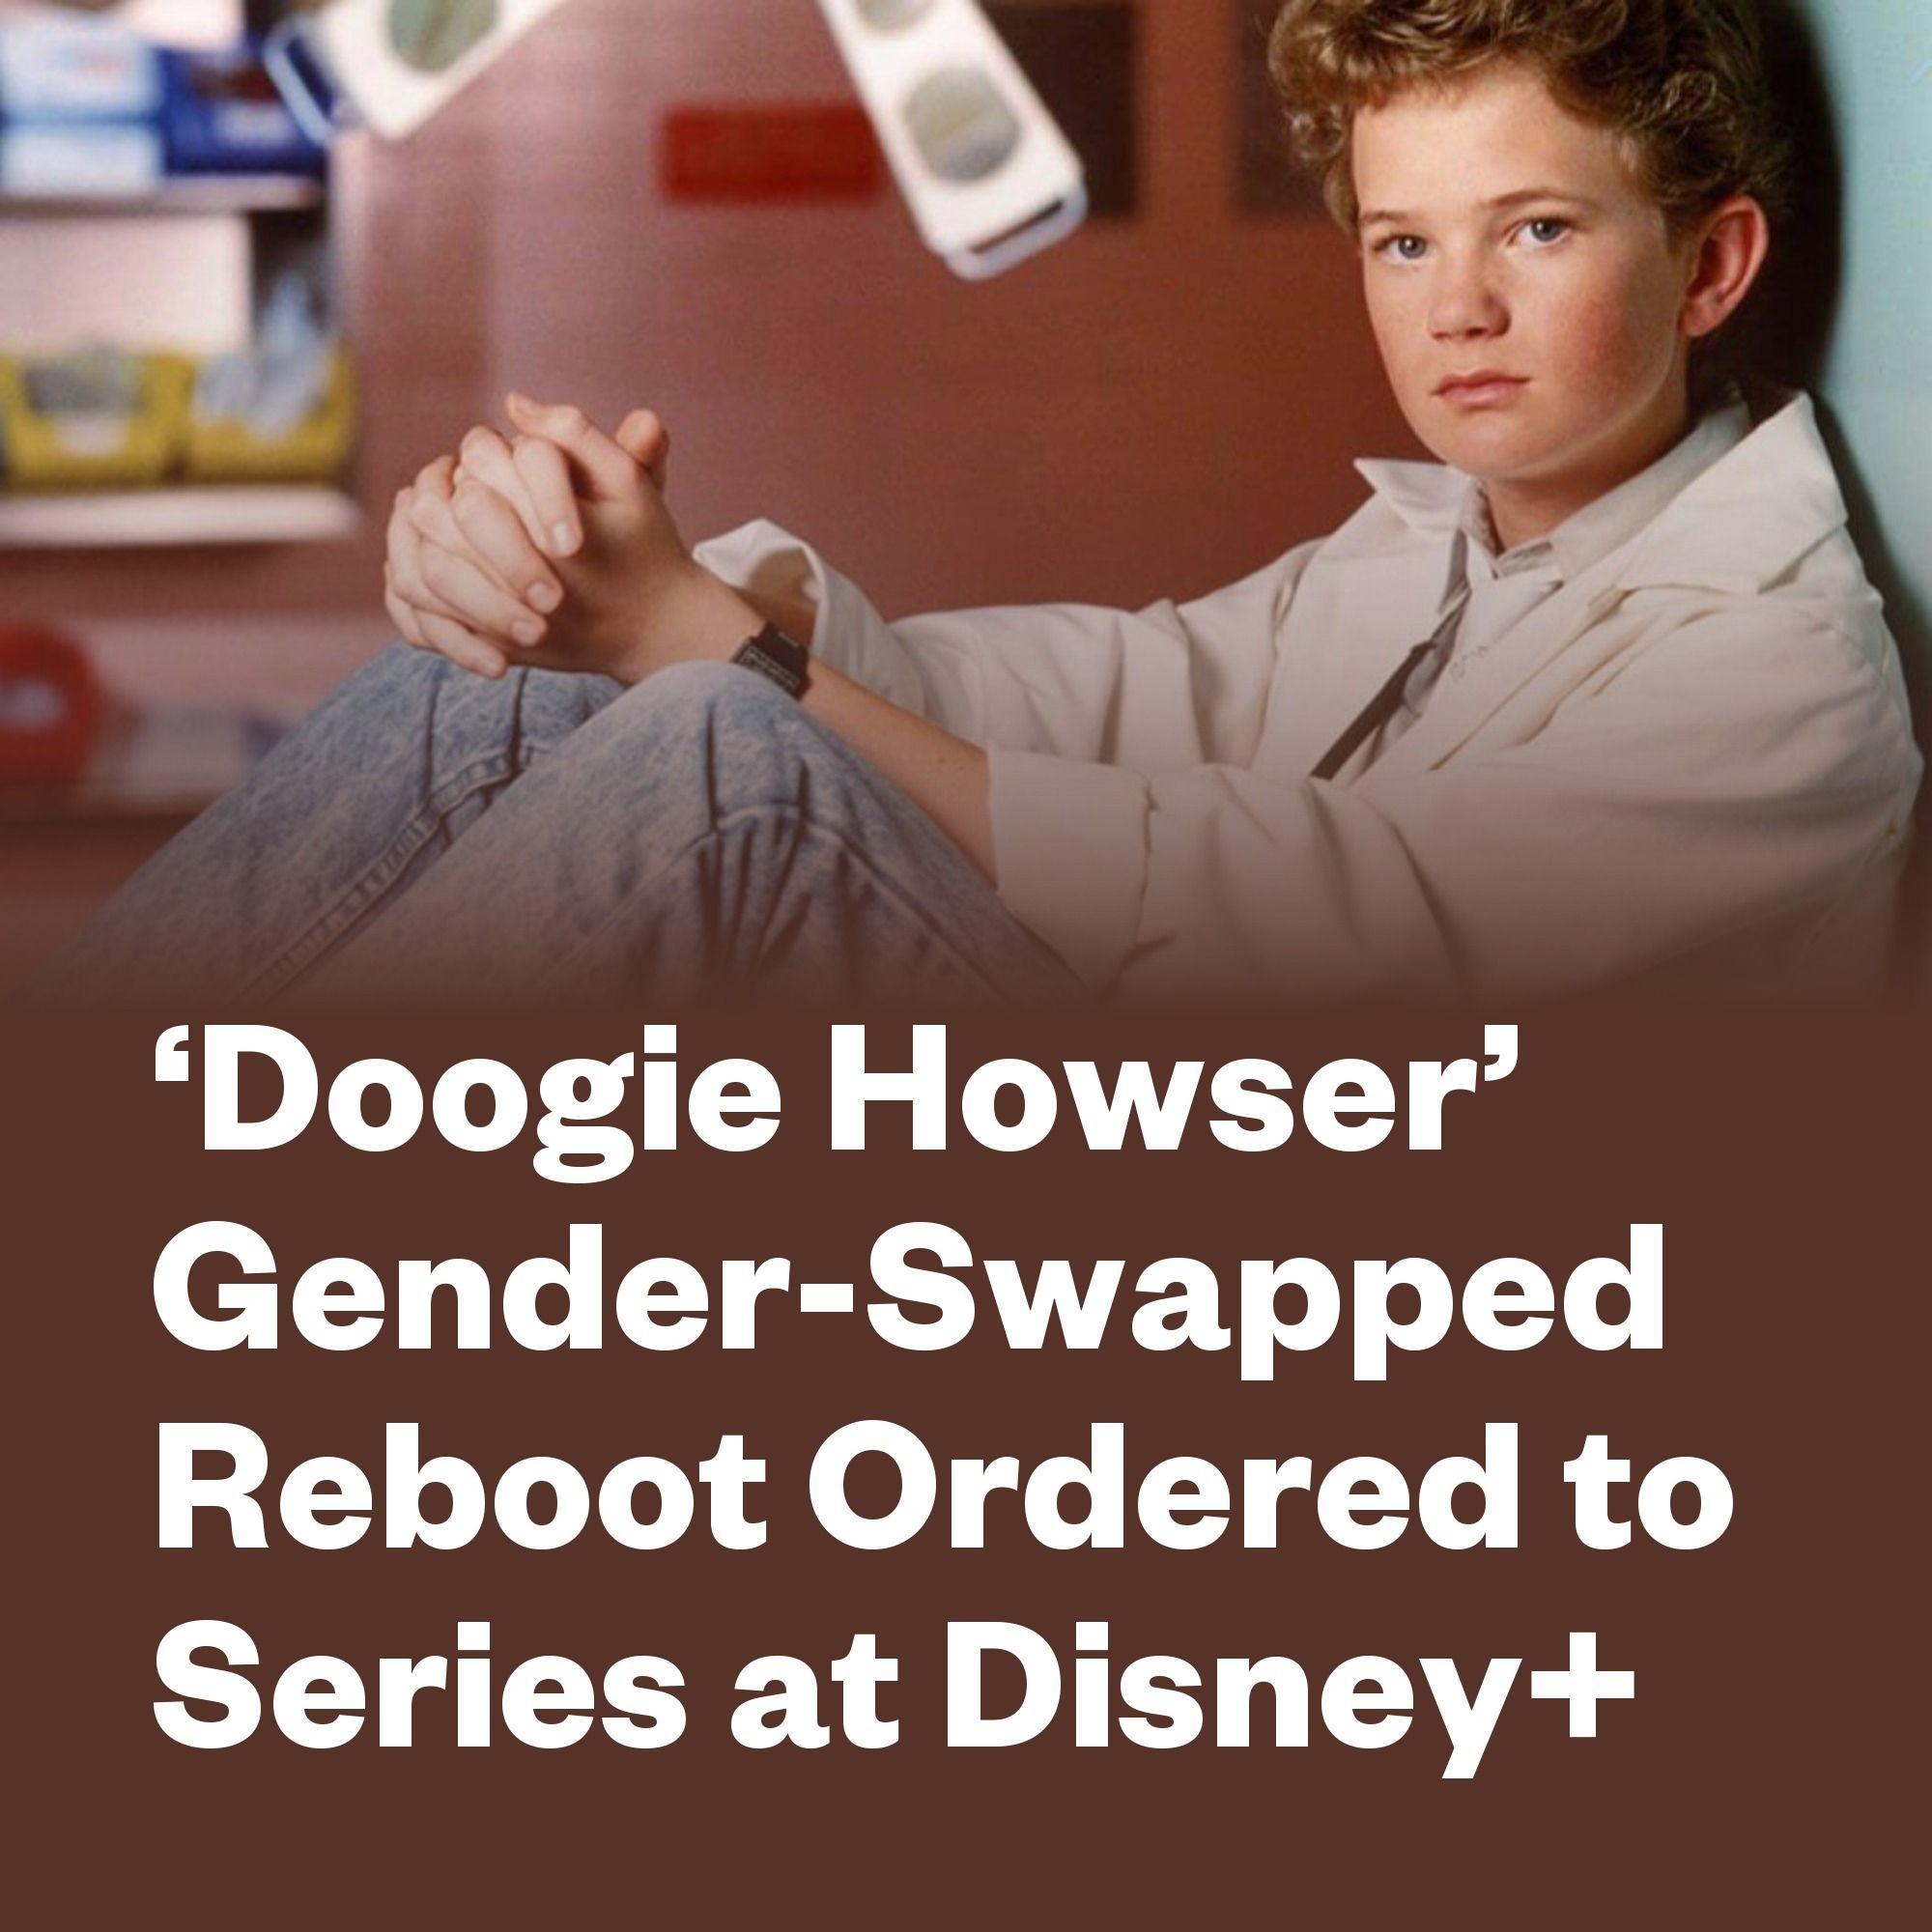 'Doogie Howser' GenderSwapped Reboot Ordered to Series at